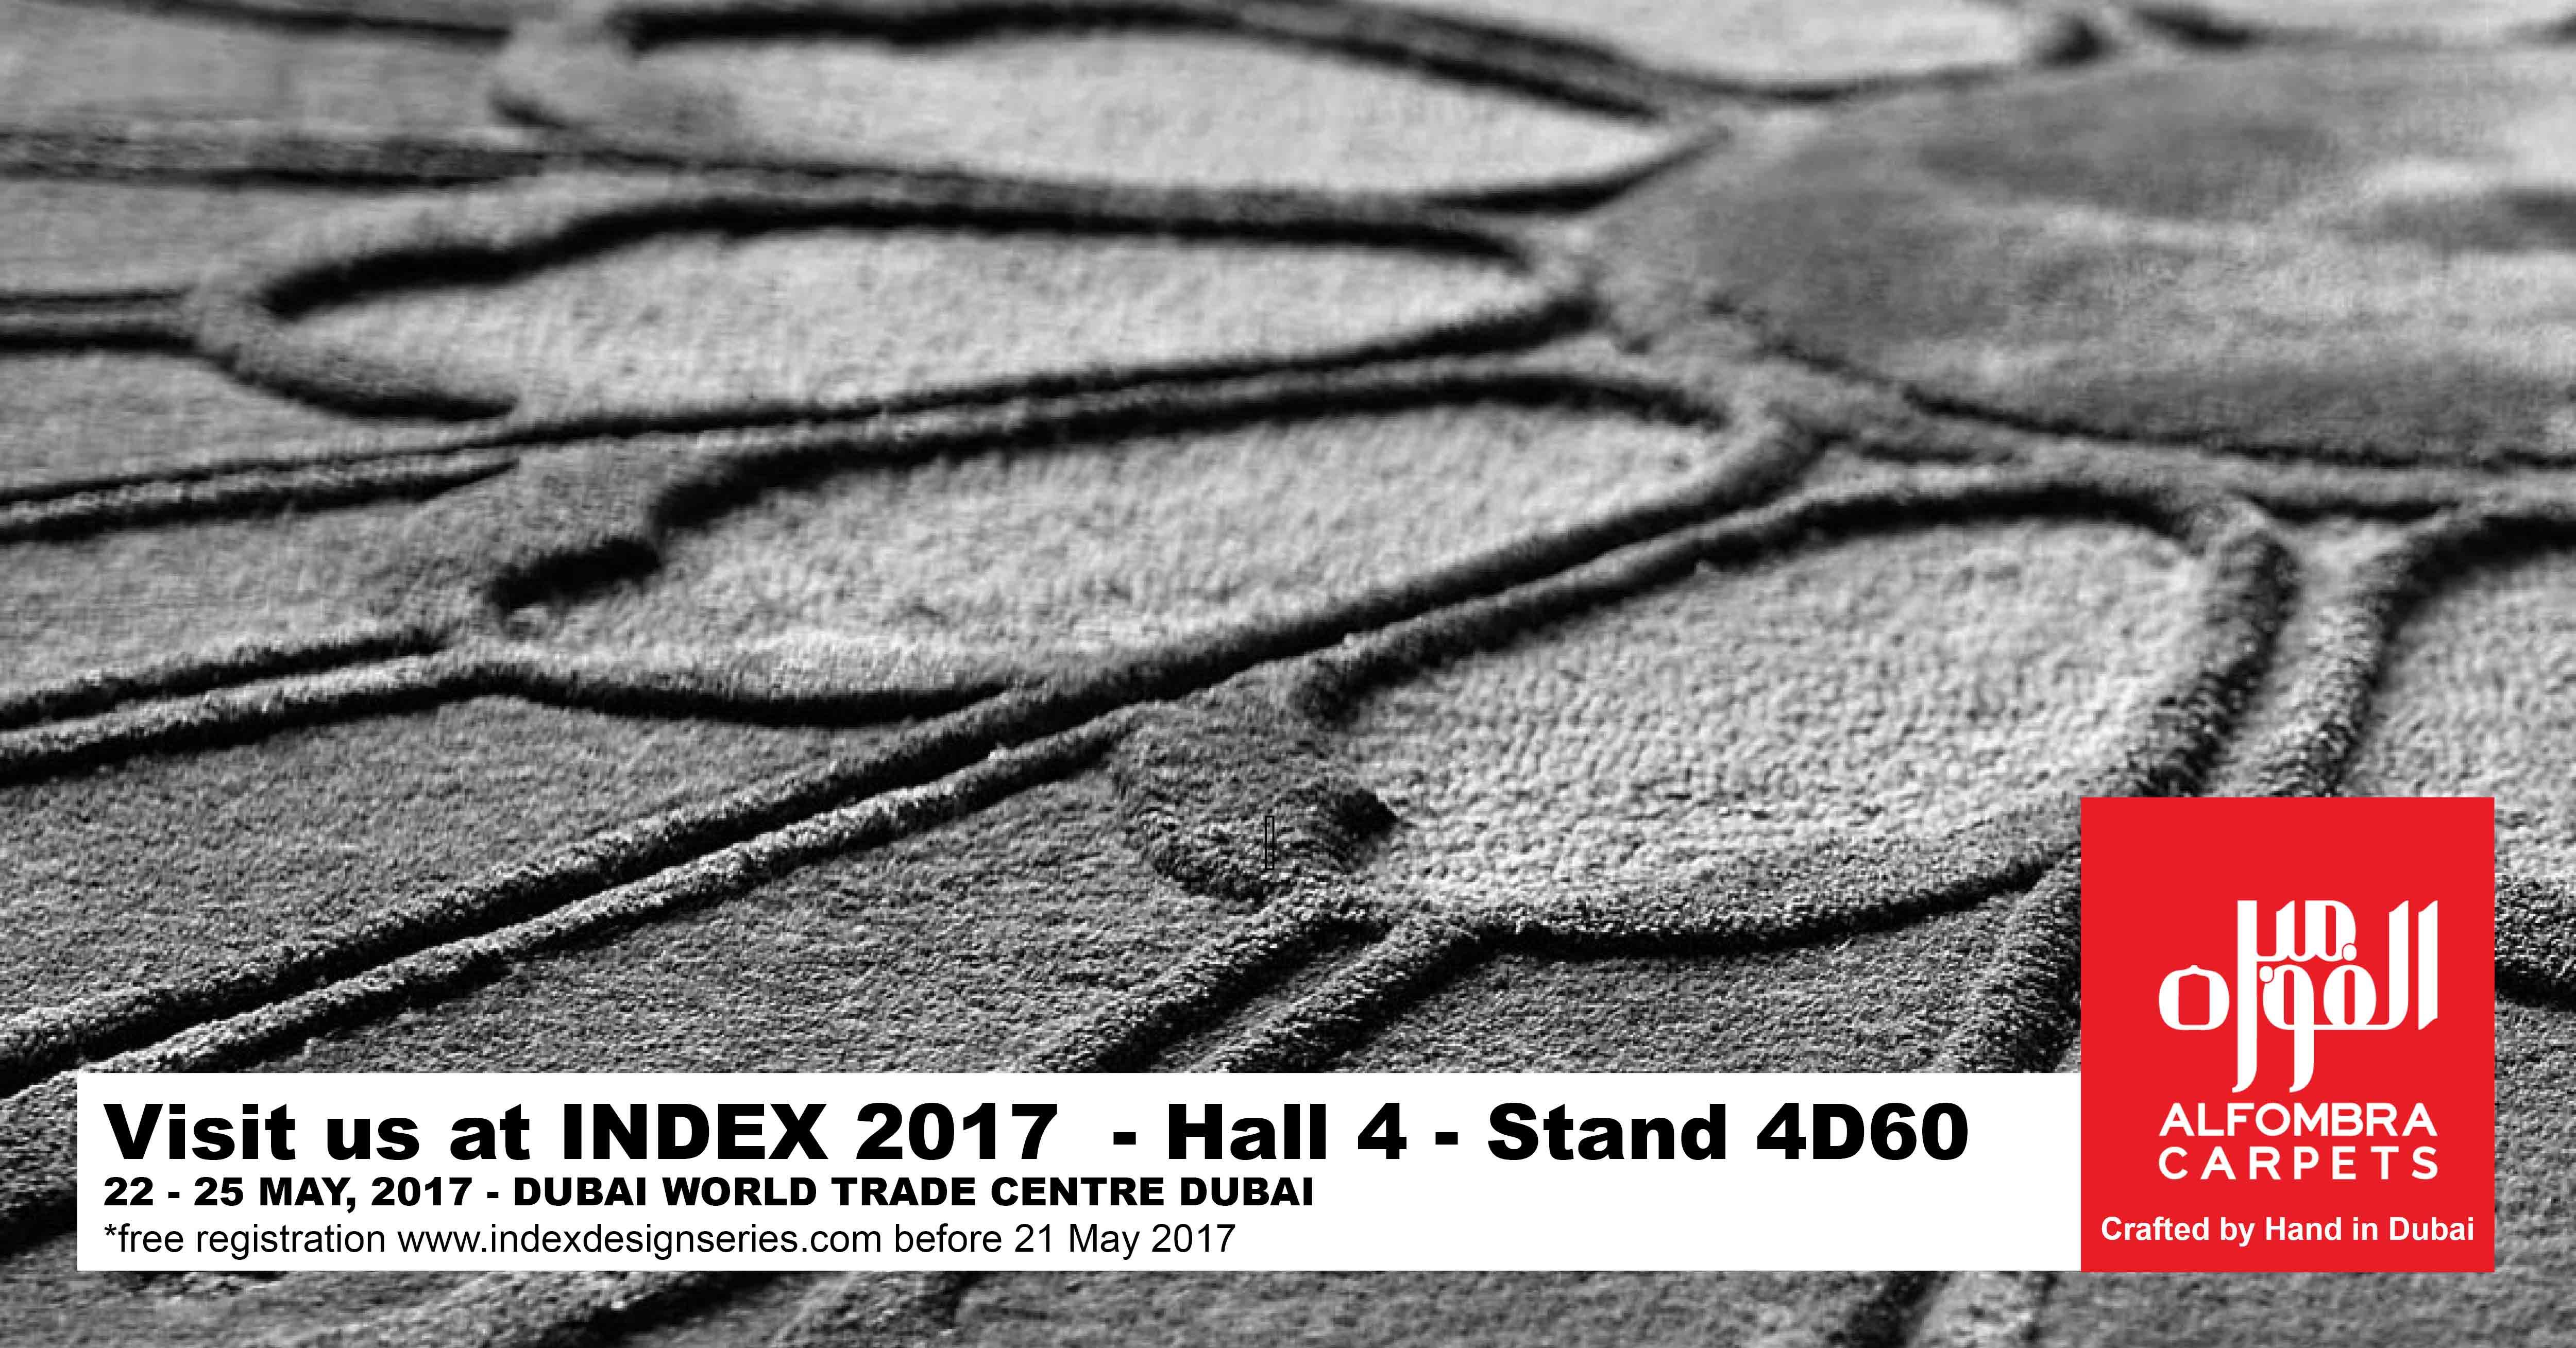 Index  DXB 2017